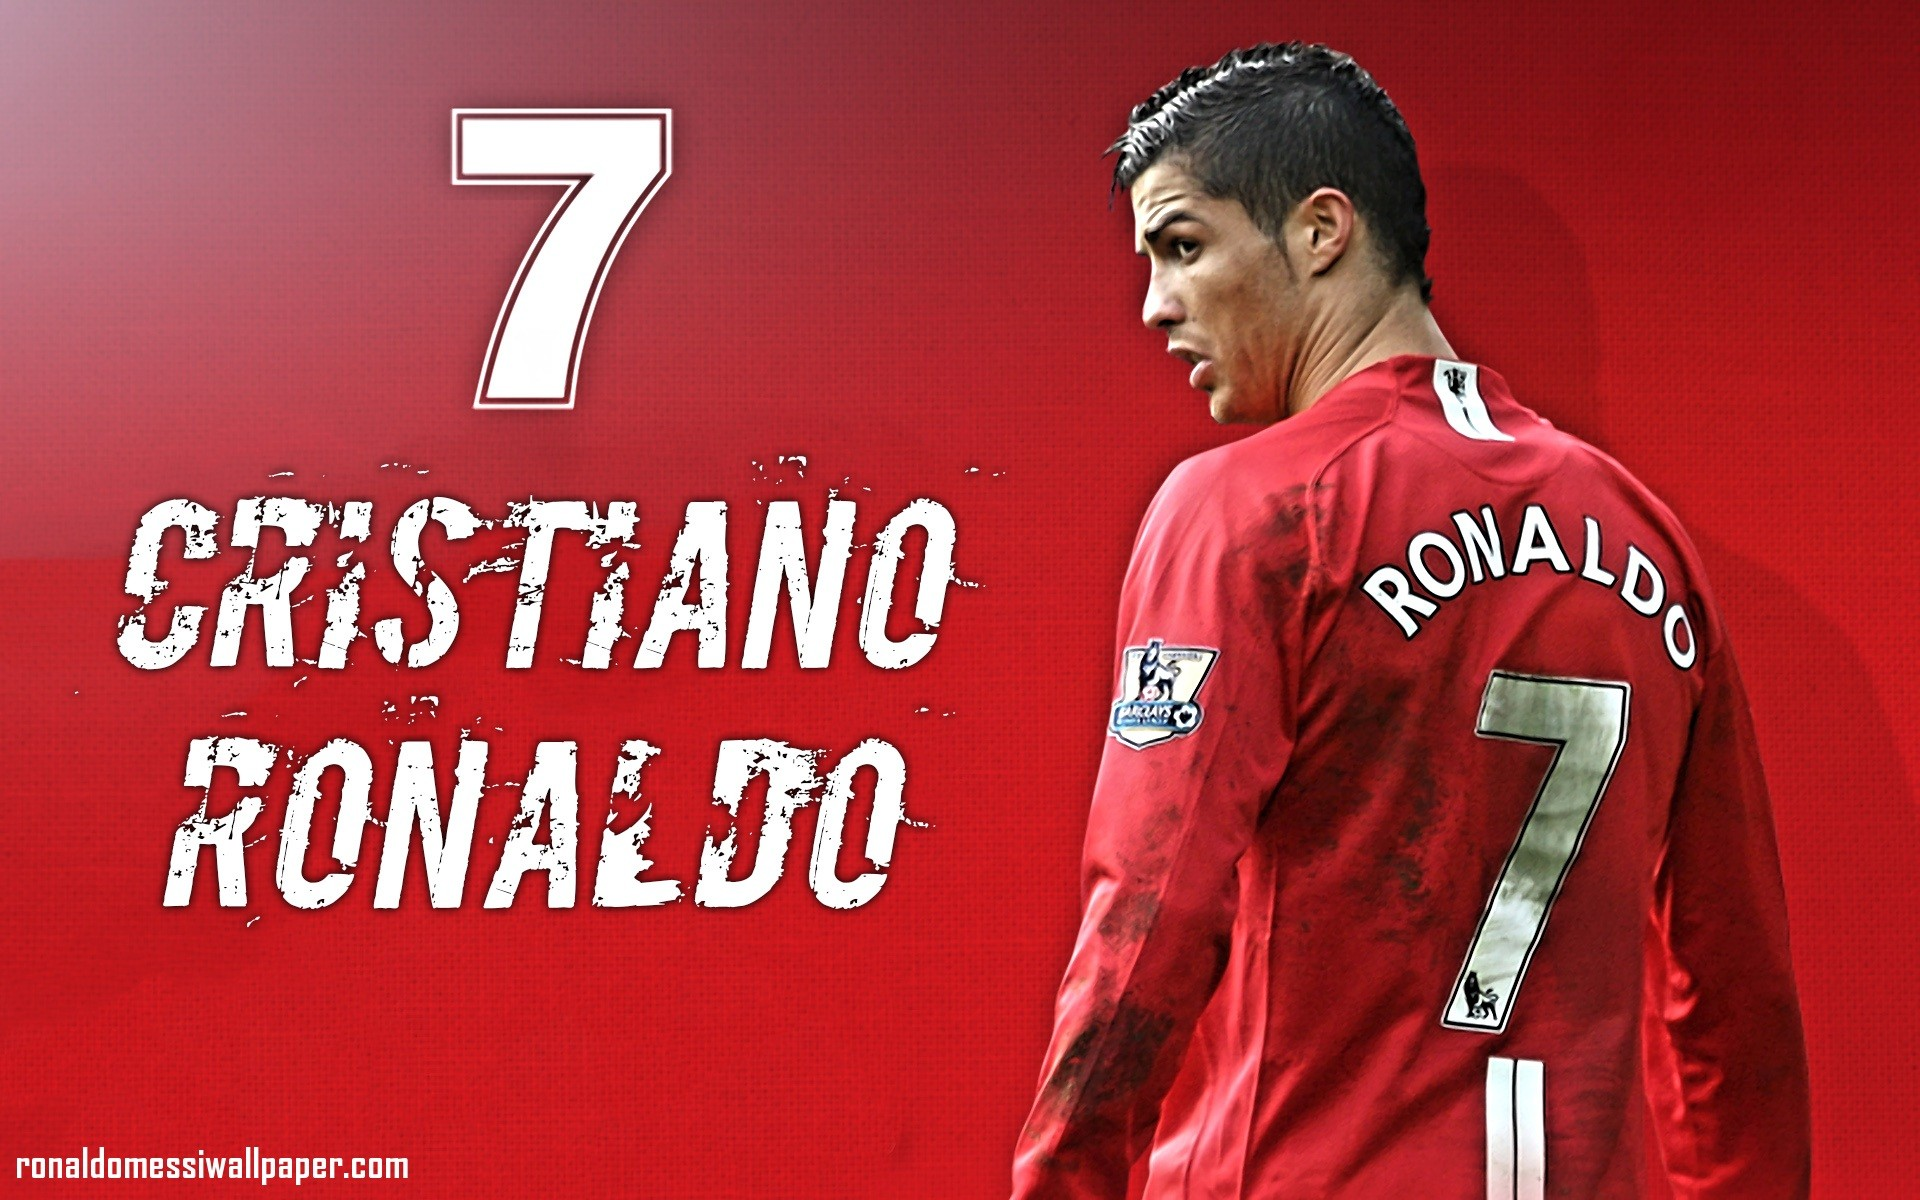 ronaldo 7 man utd